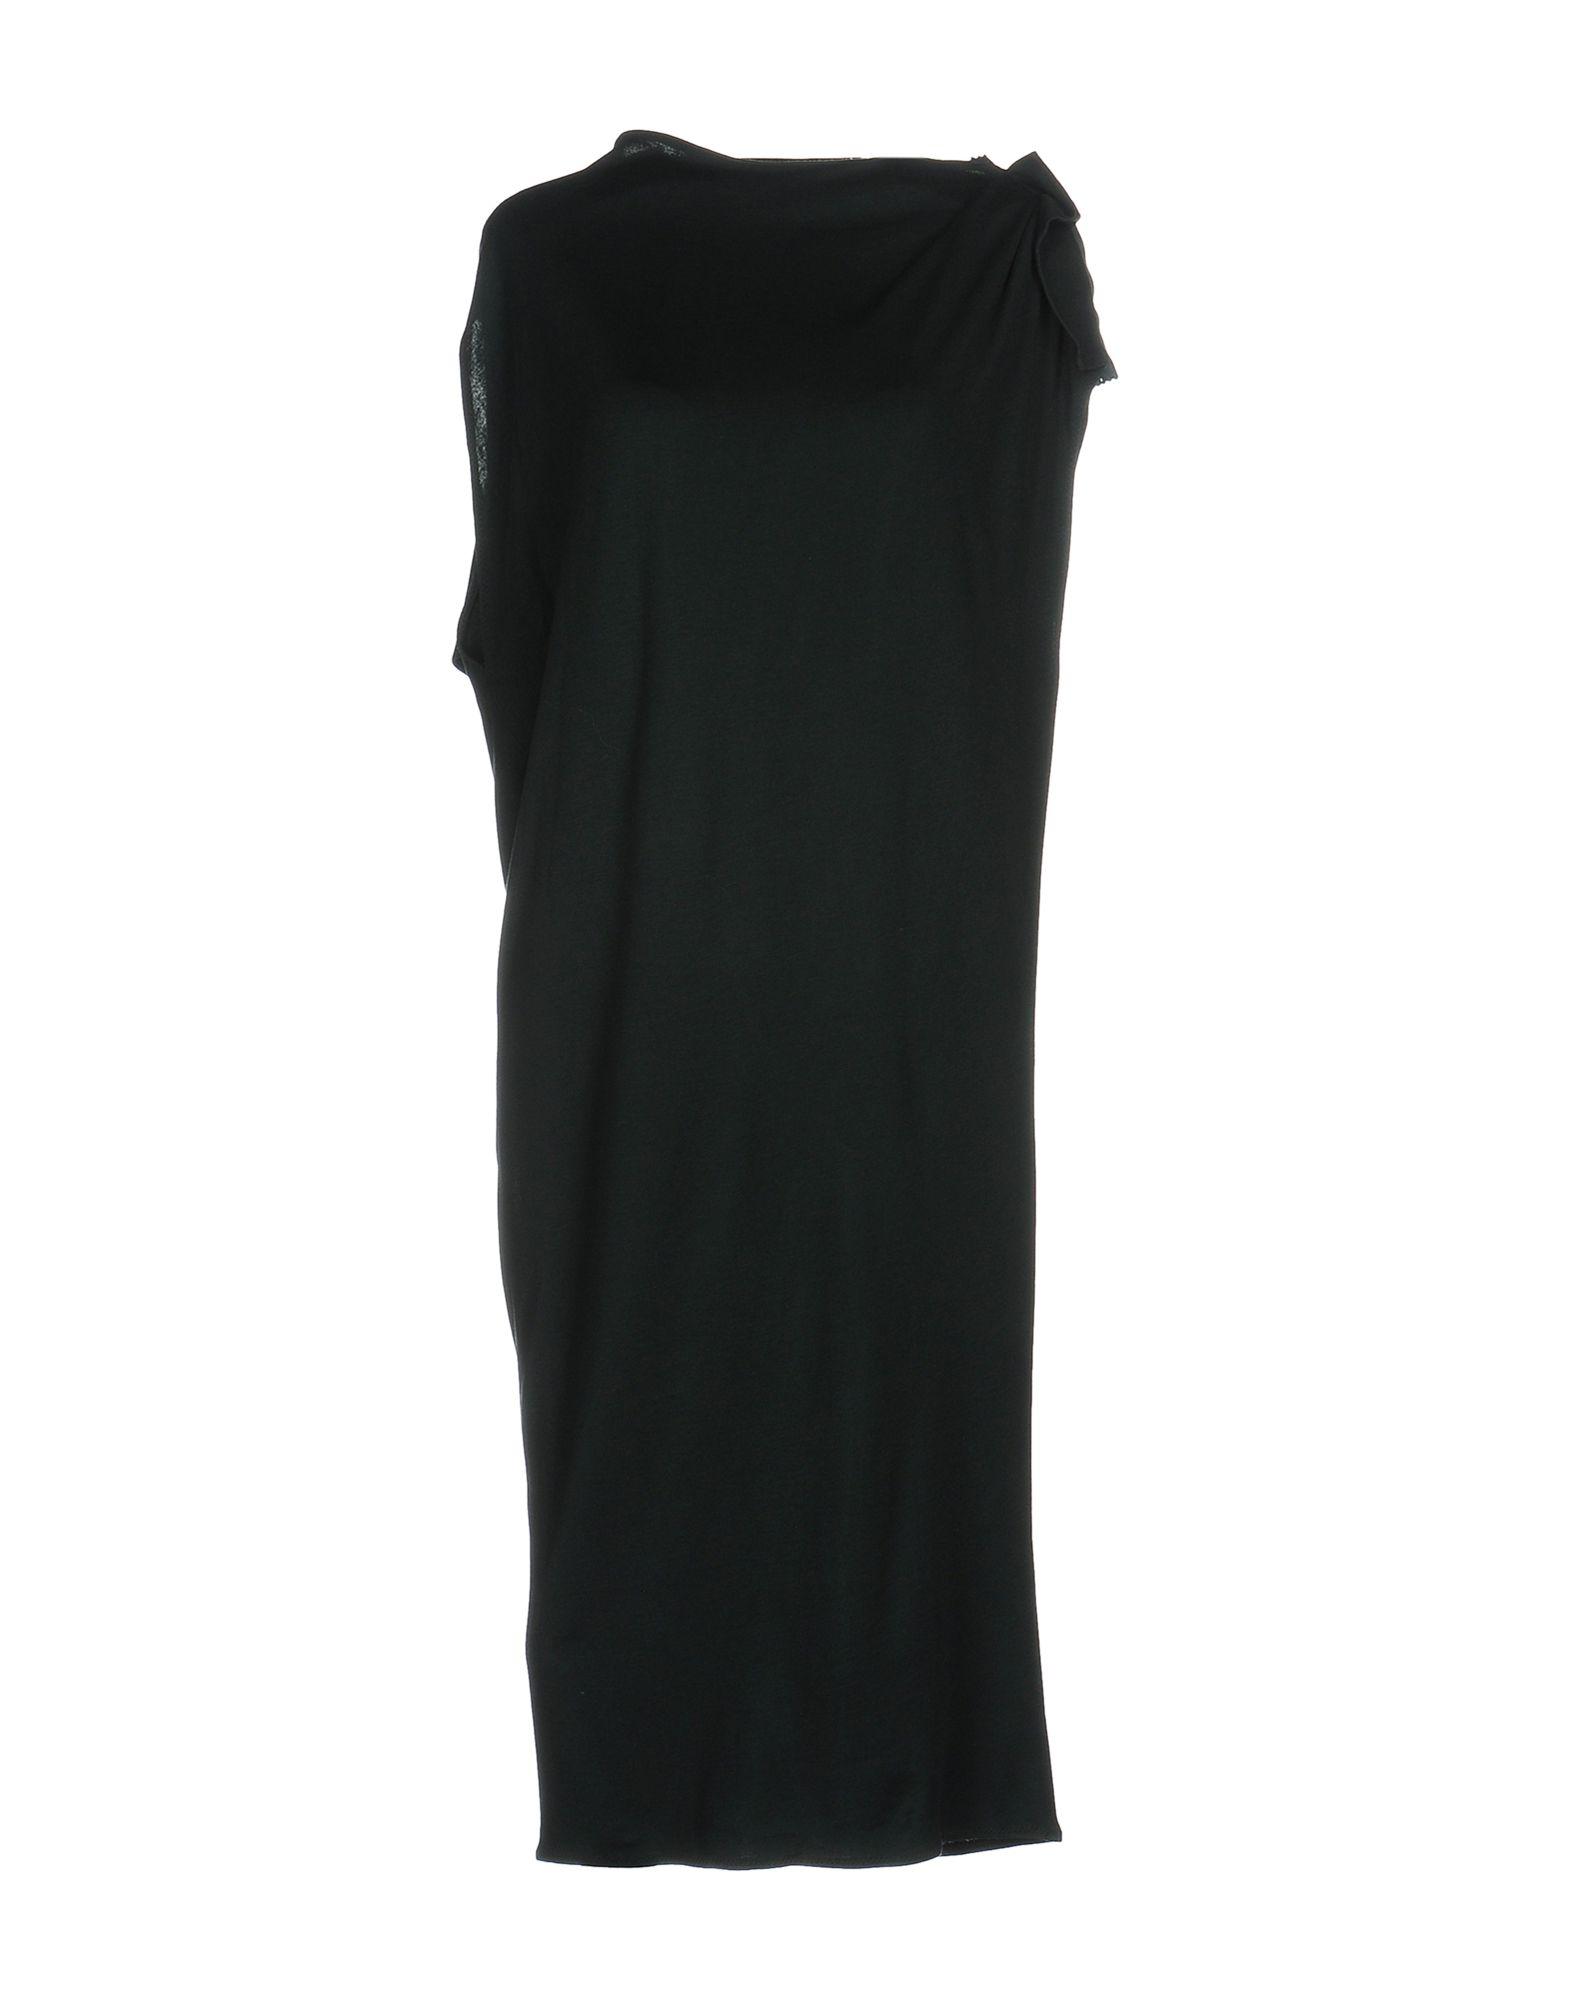 LANVIN Платье длиной 3/4 lisa corti платье длиной 3 4